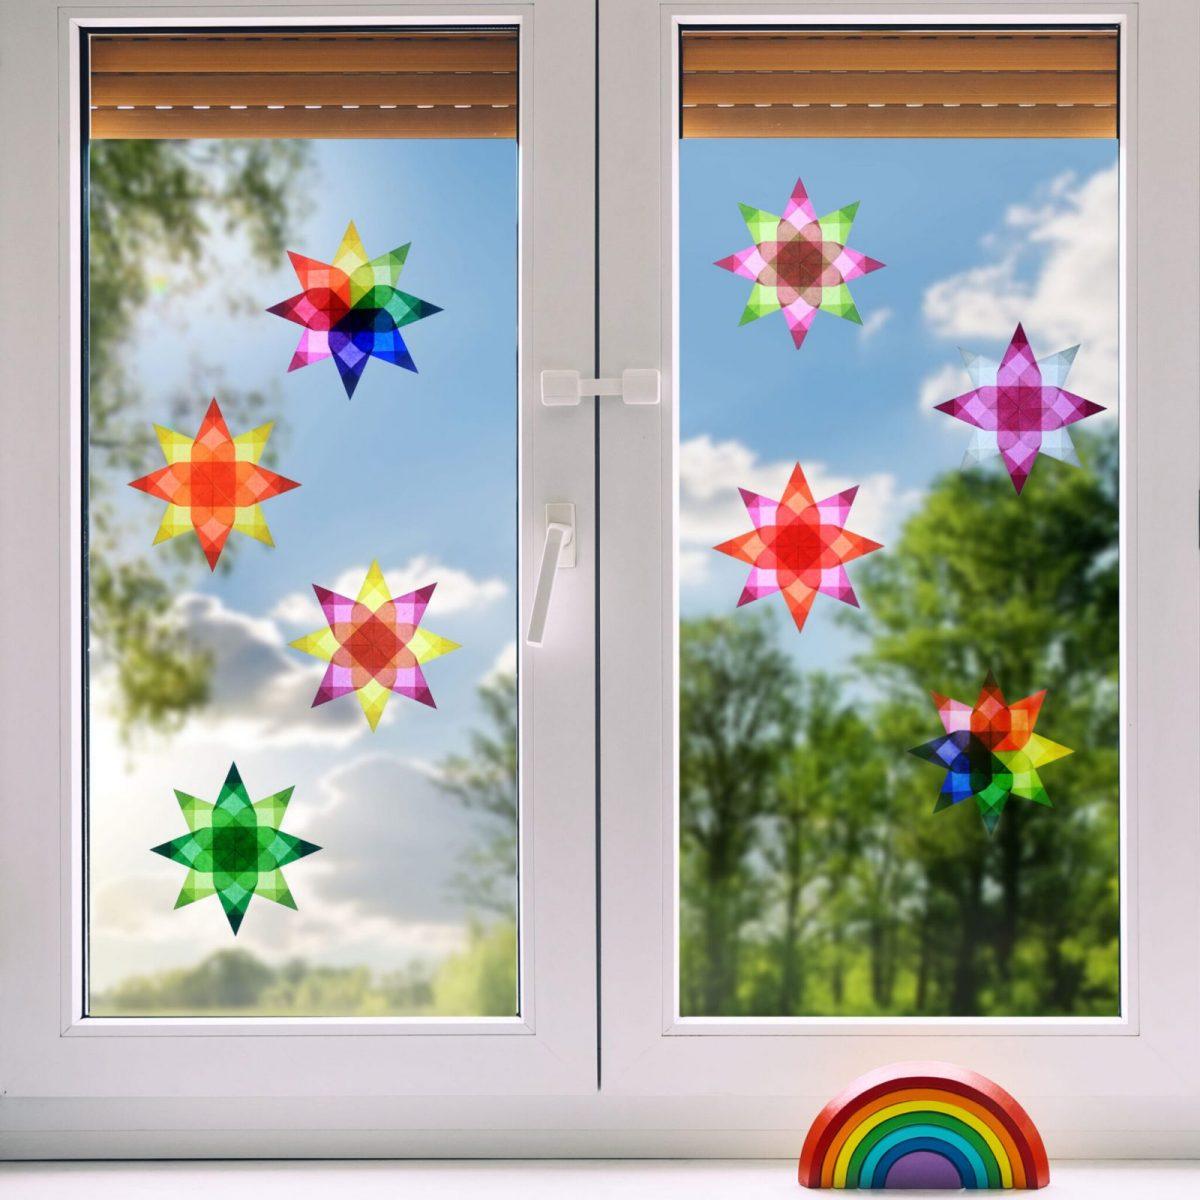 Cosmic Candy stars on Window